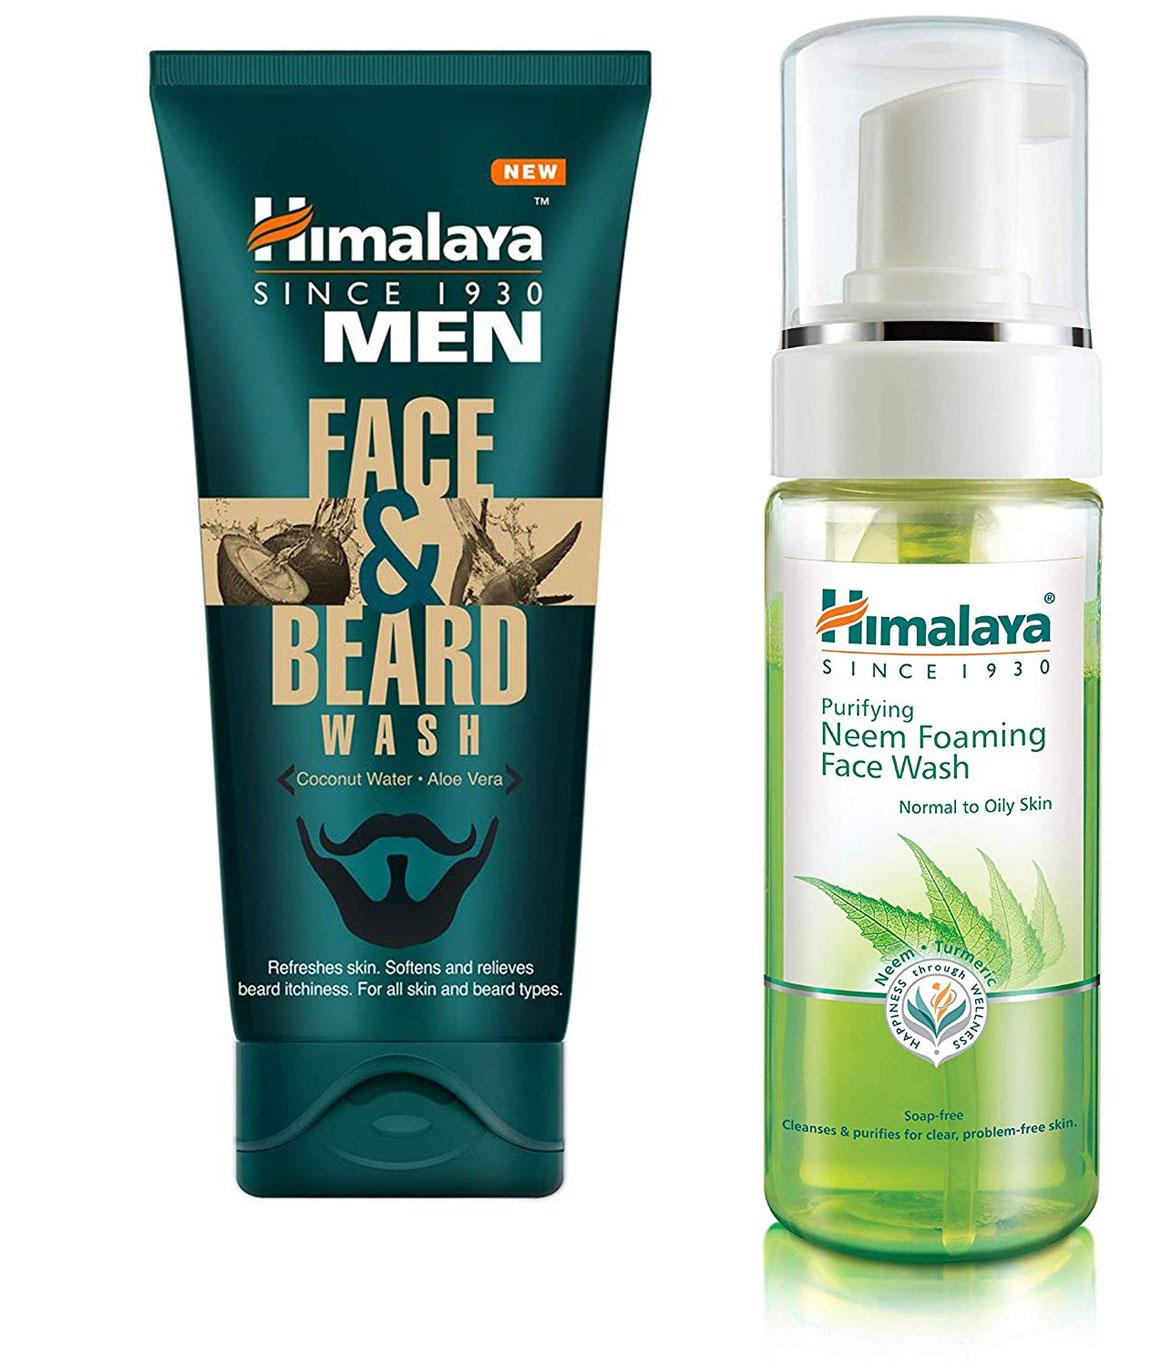 Himalaya Men Face And Beard Wash 80ml and Himalaya Herbals Purifying Neem Foaming Face Wash 150ml